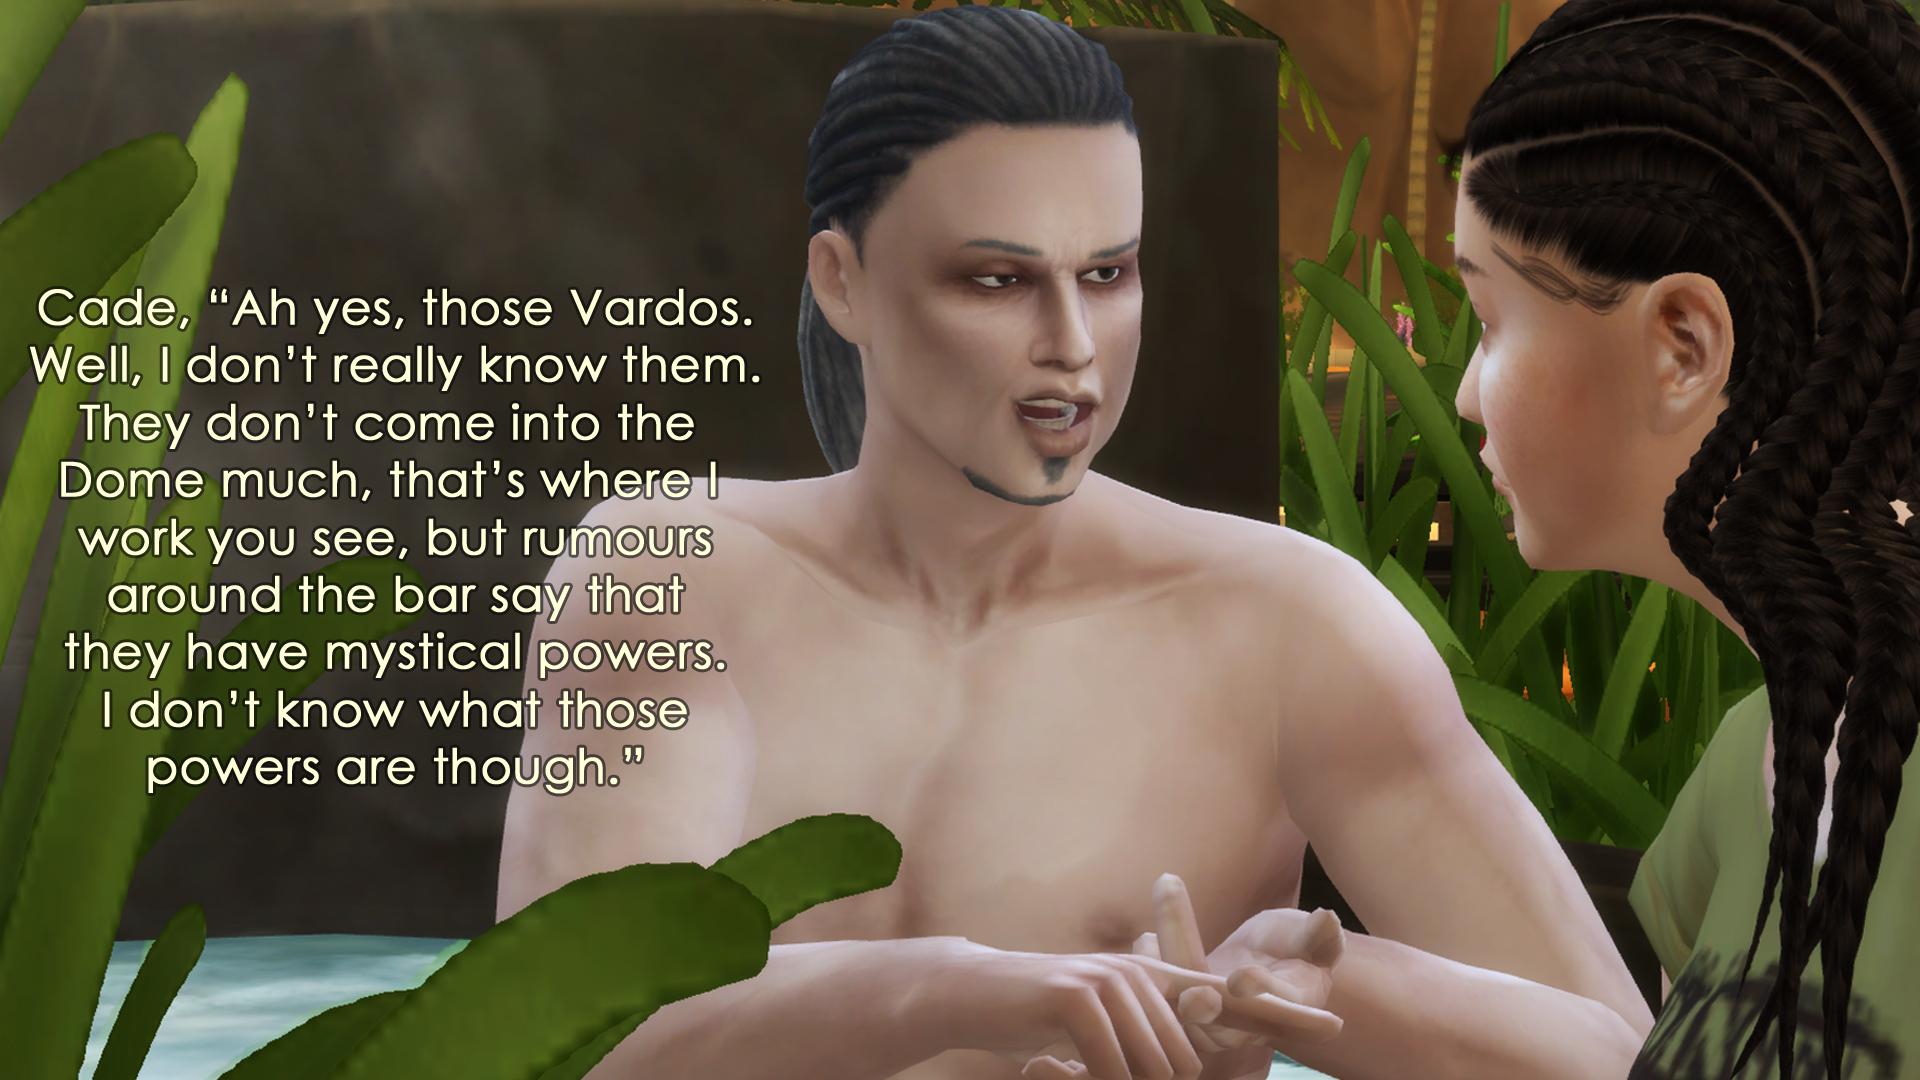 Who are the vardos 7